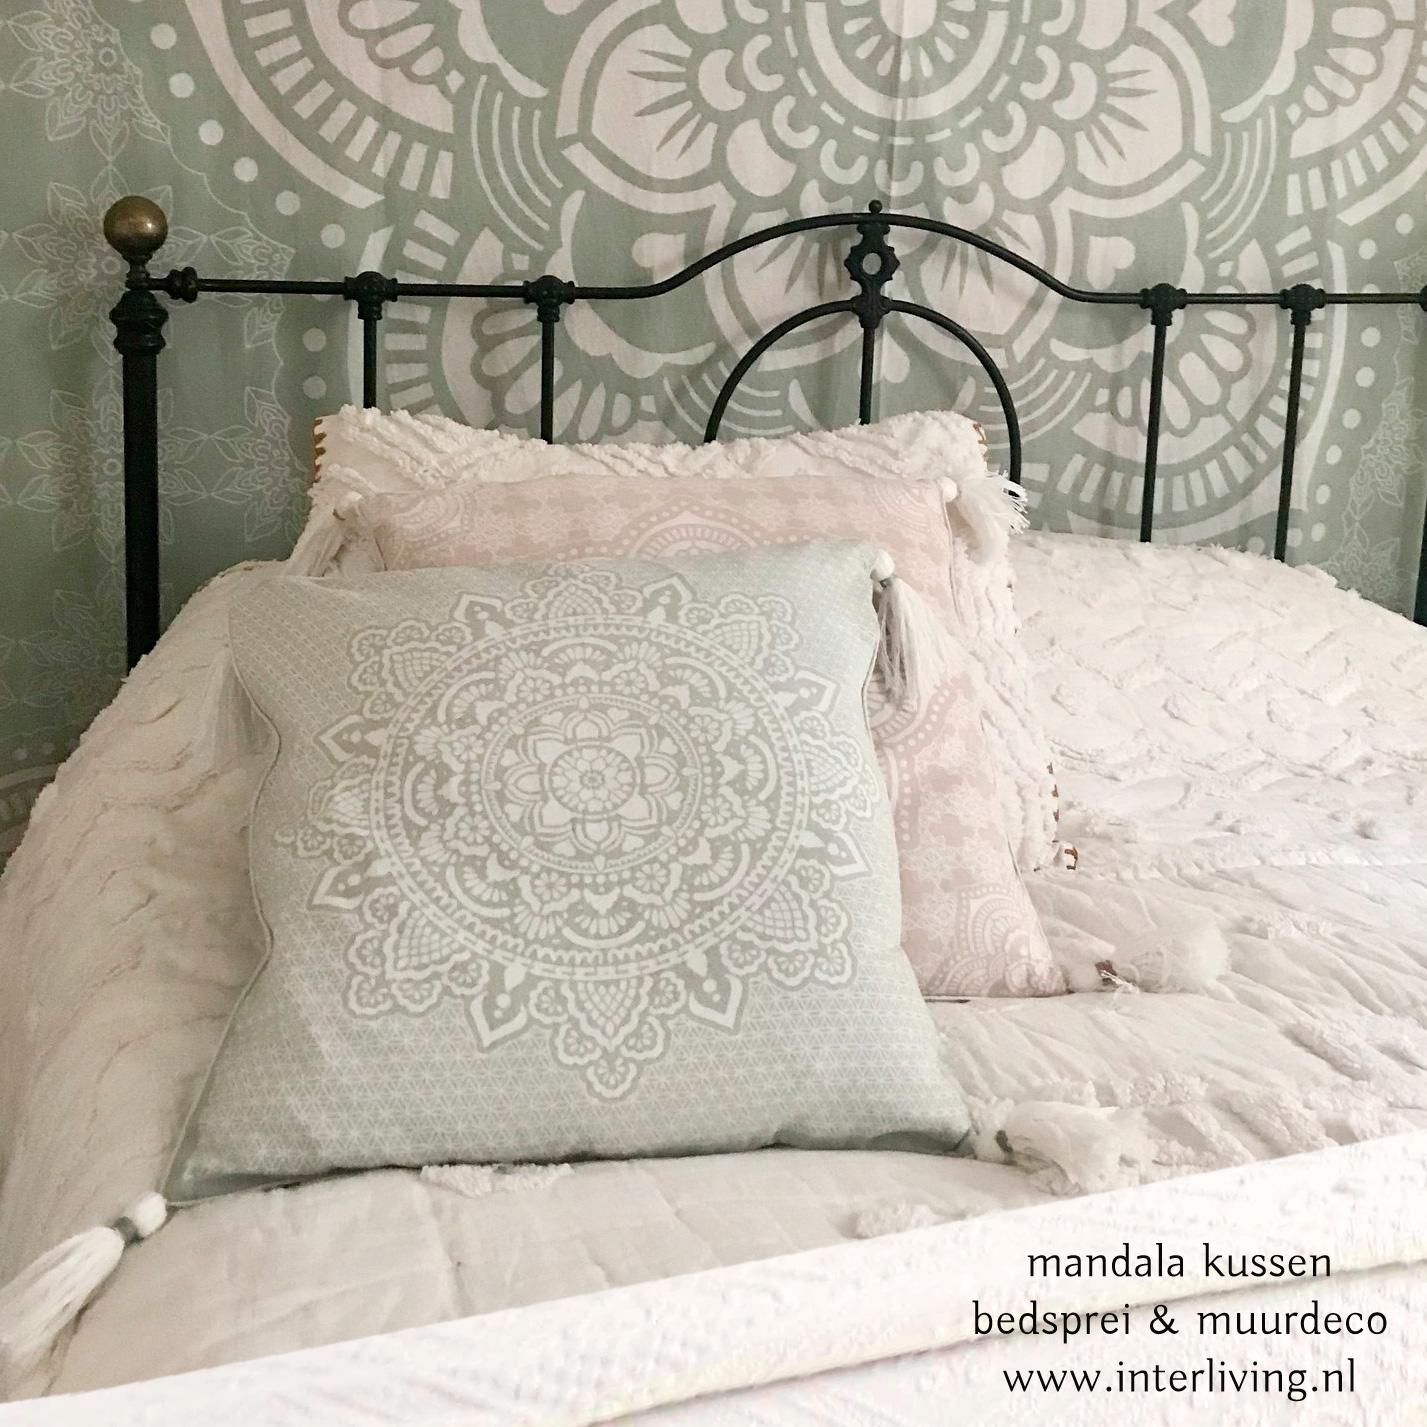 katoen doek of laken met Mandala print - wit groen bedsprei Boho Ibiza chic